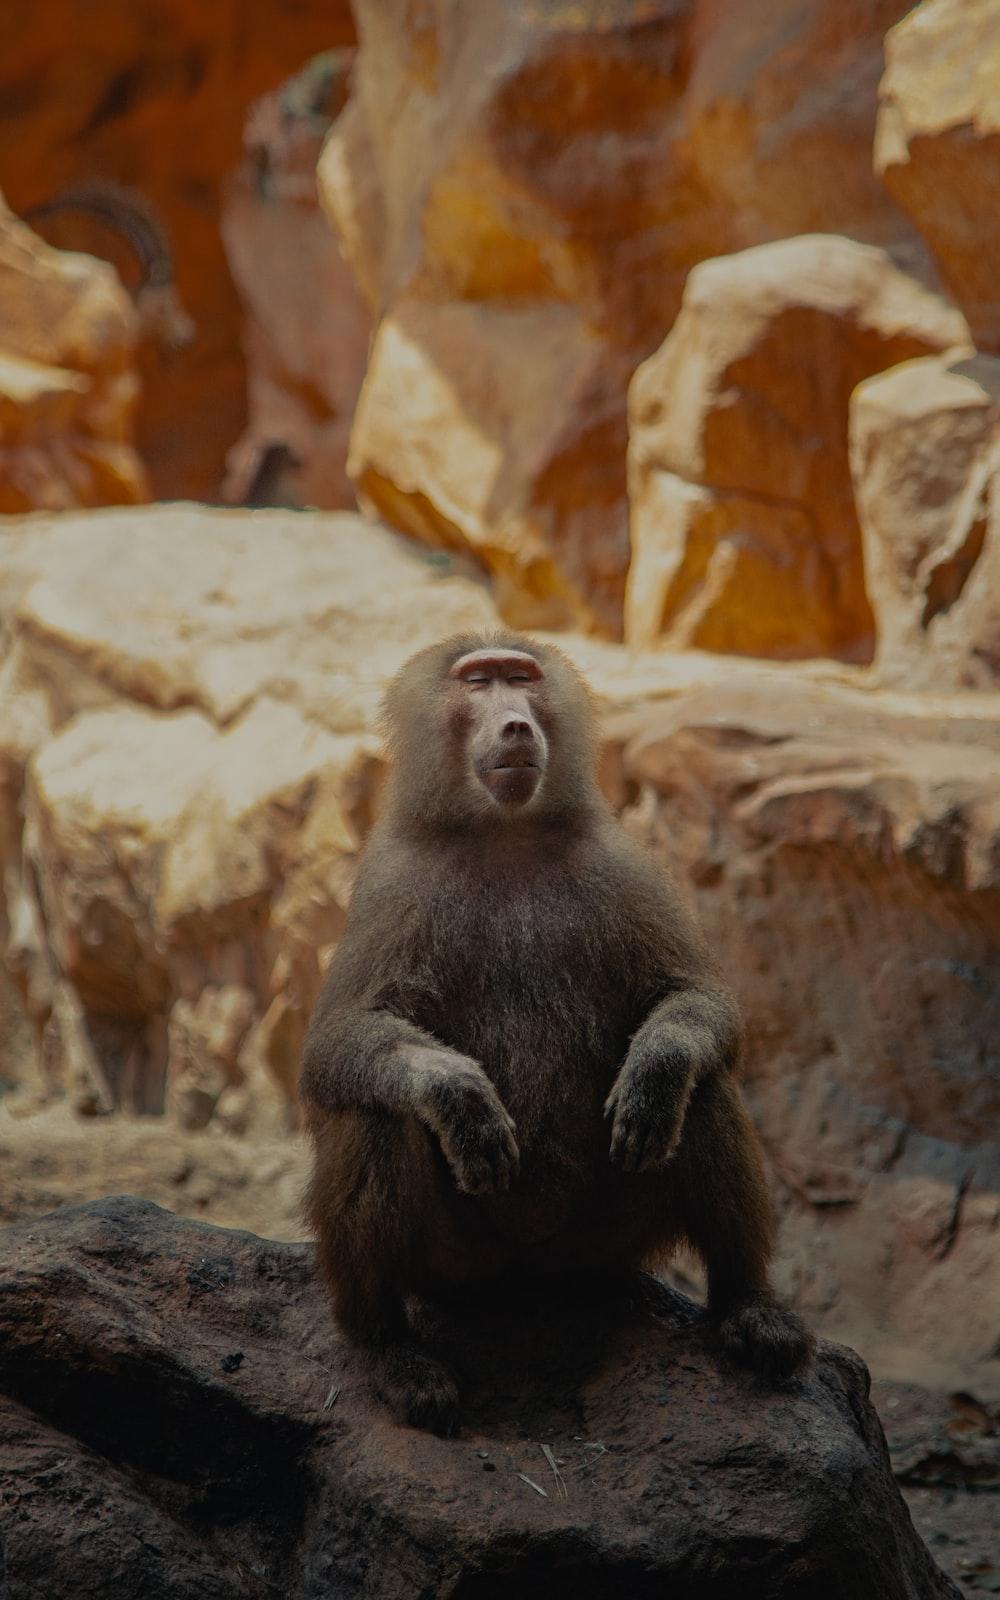 black monkey sitting on rock during daytime